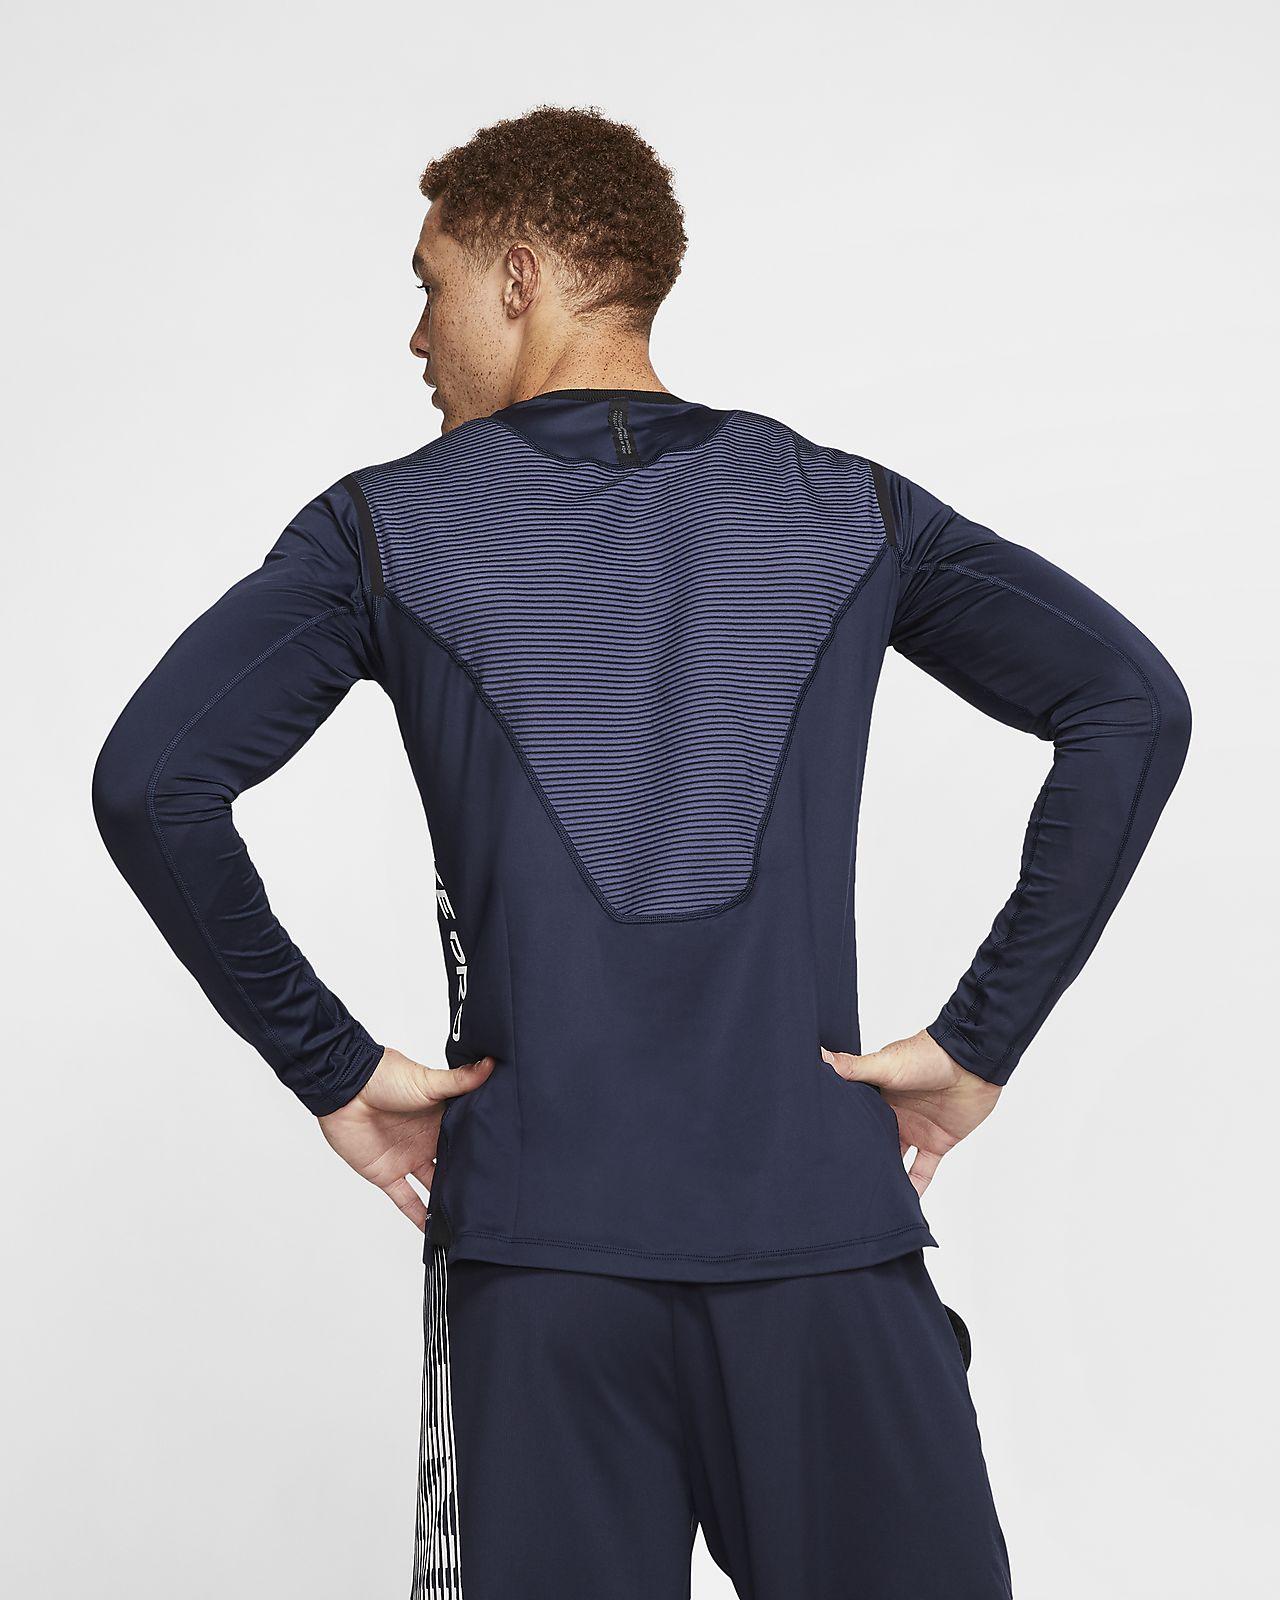 Nike Pro AeroAdapt Langarm-Oberteil für Damen